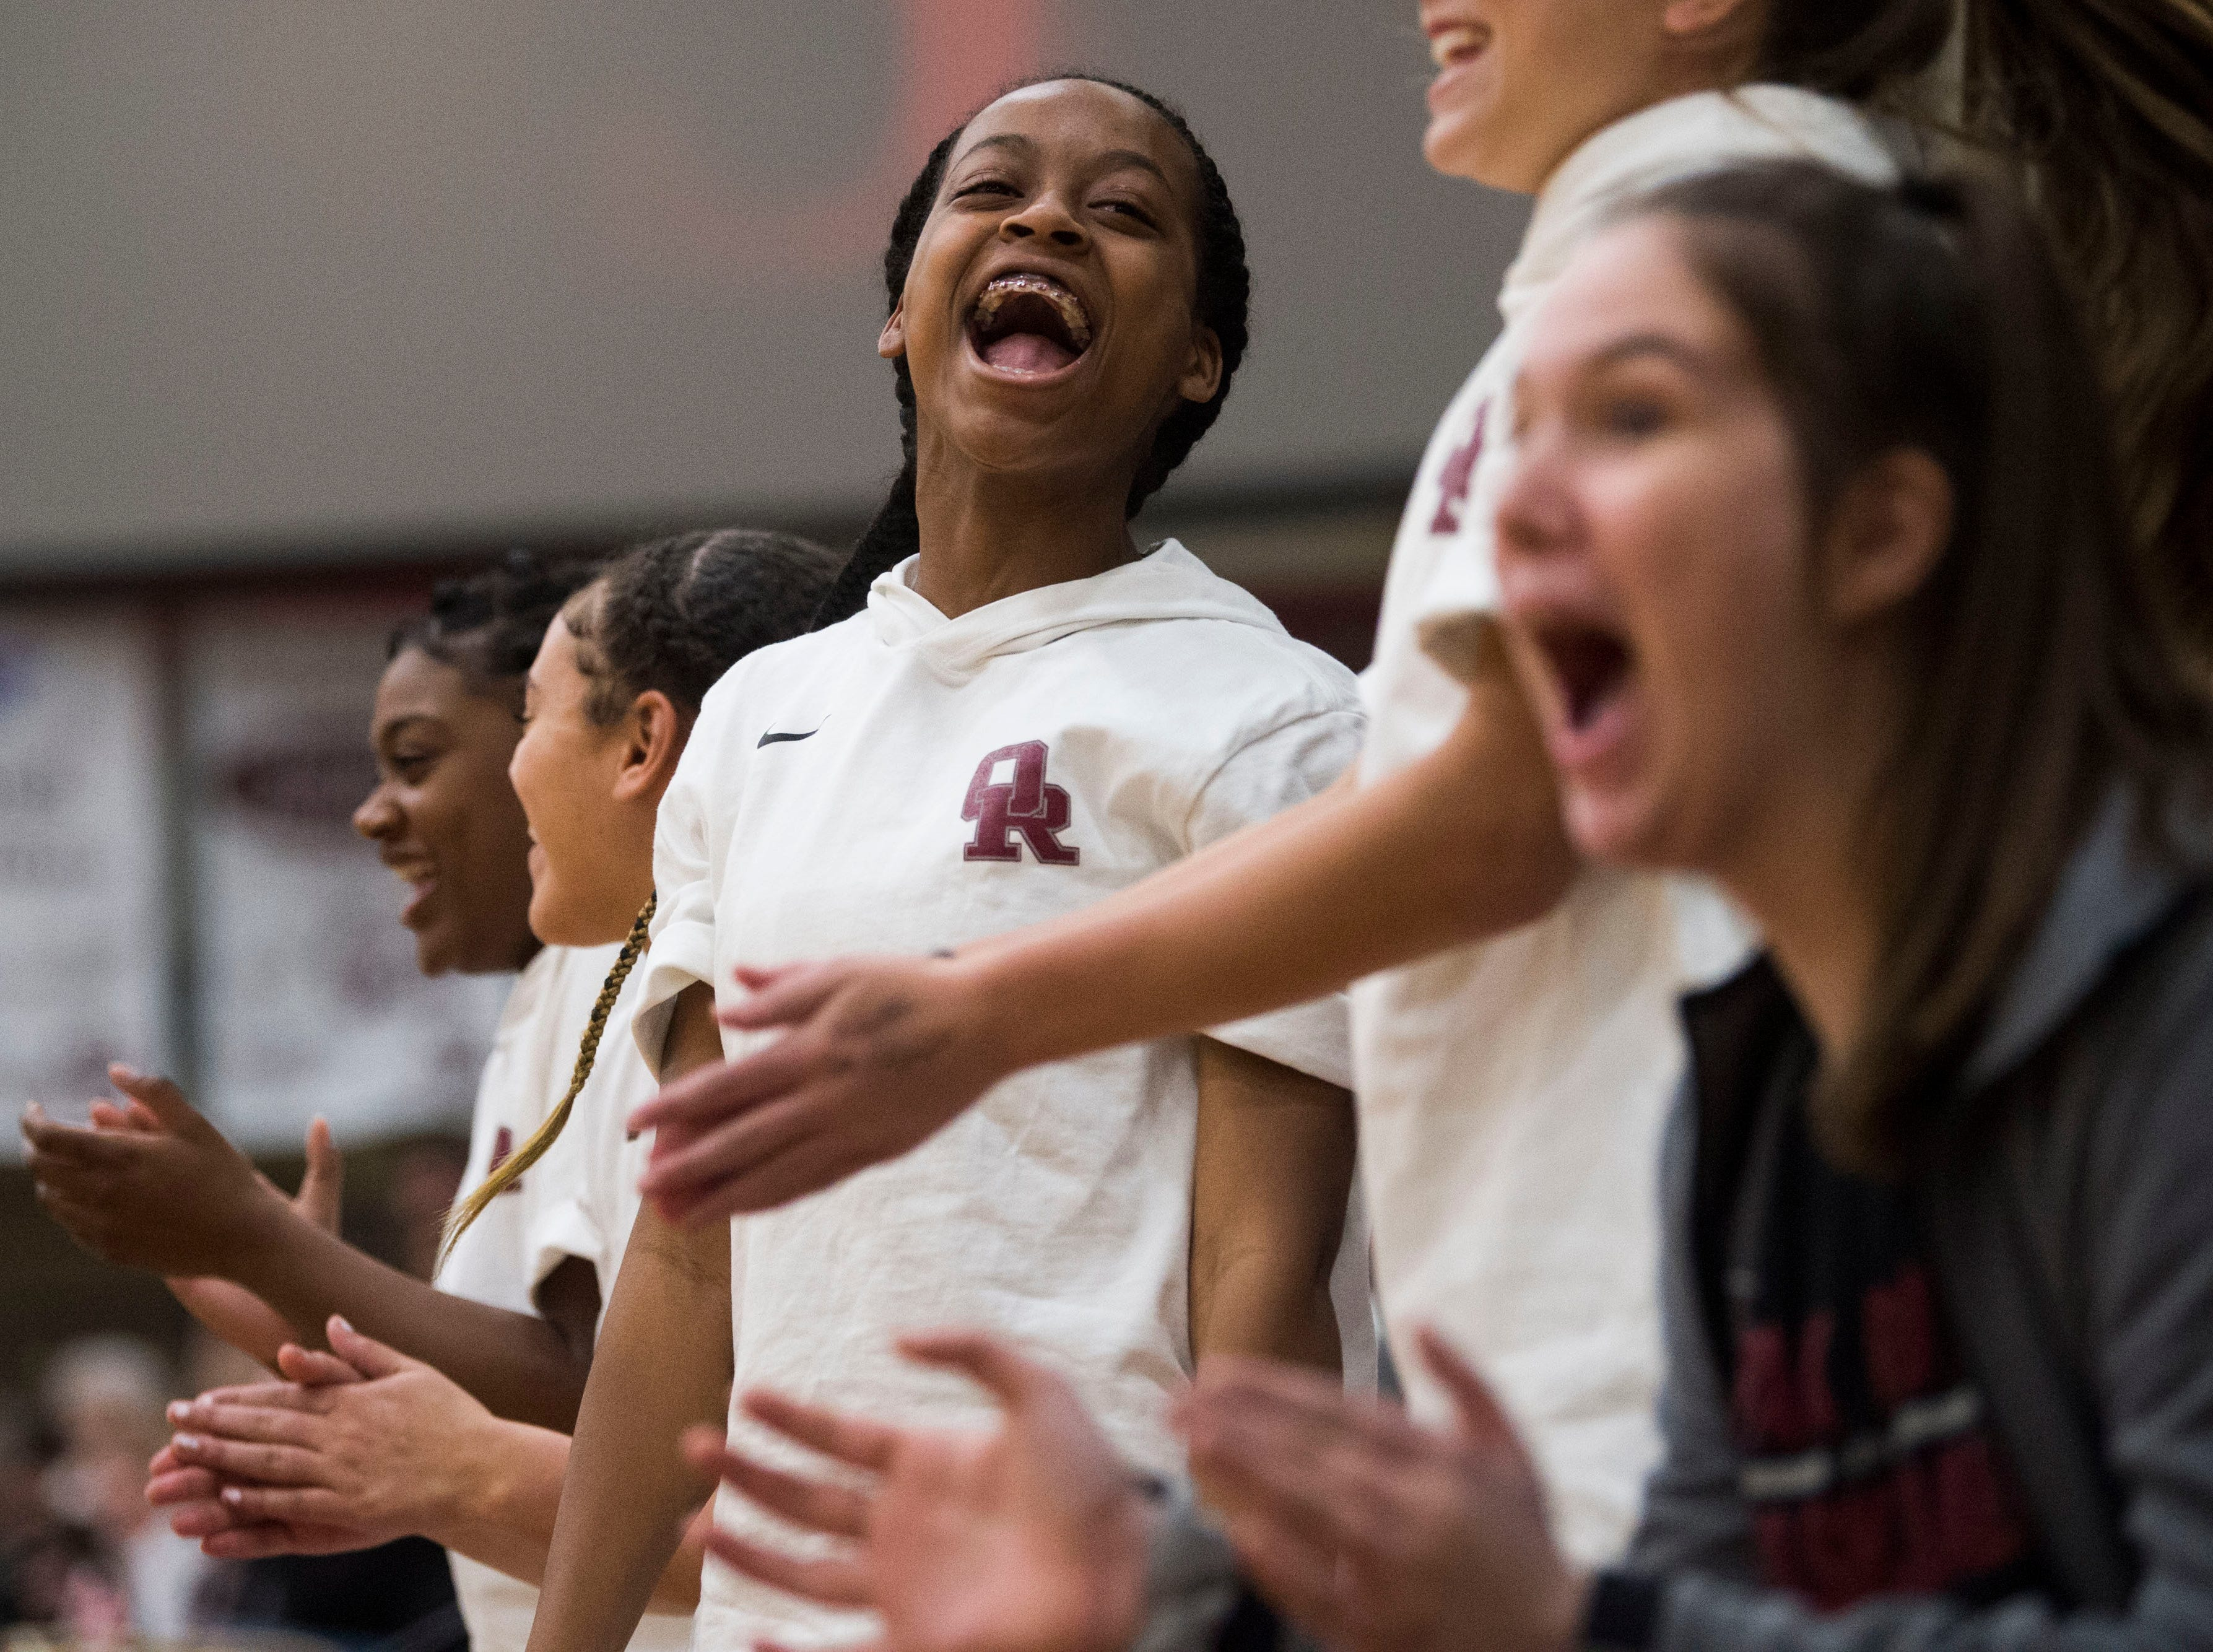 Oak Ridge's Semaj Clark celebrates on the bench during a high school basketball game between Oak Ridge and Campbell County at Oak Ridge Friday, Feb. 1, 2019.